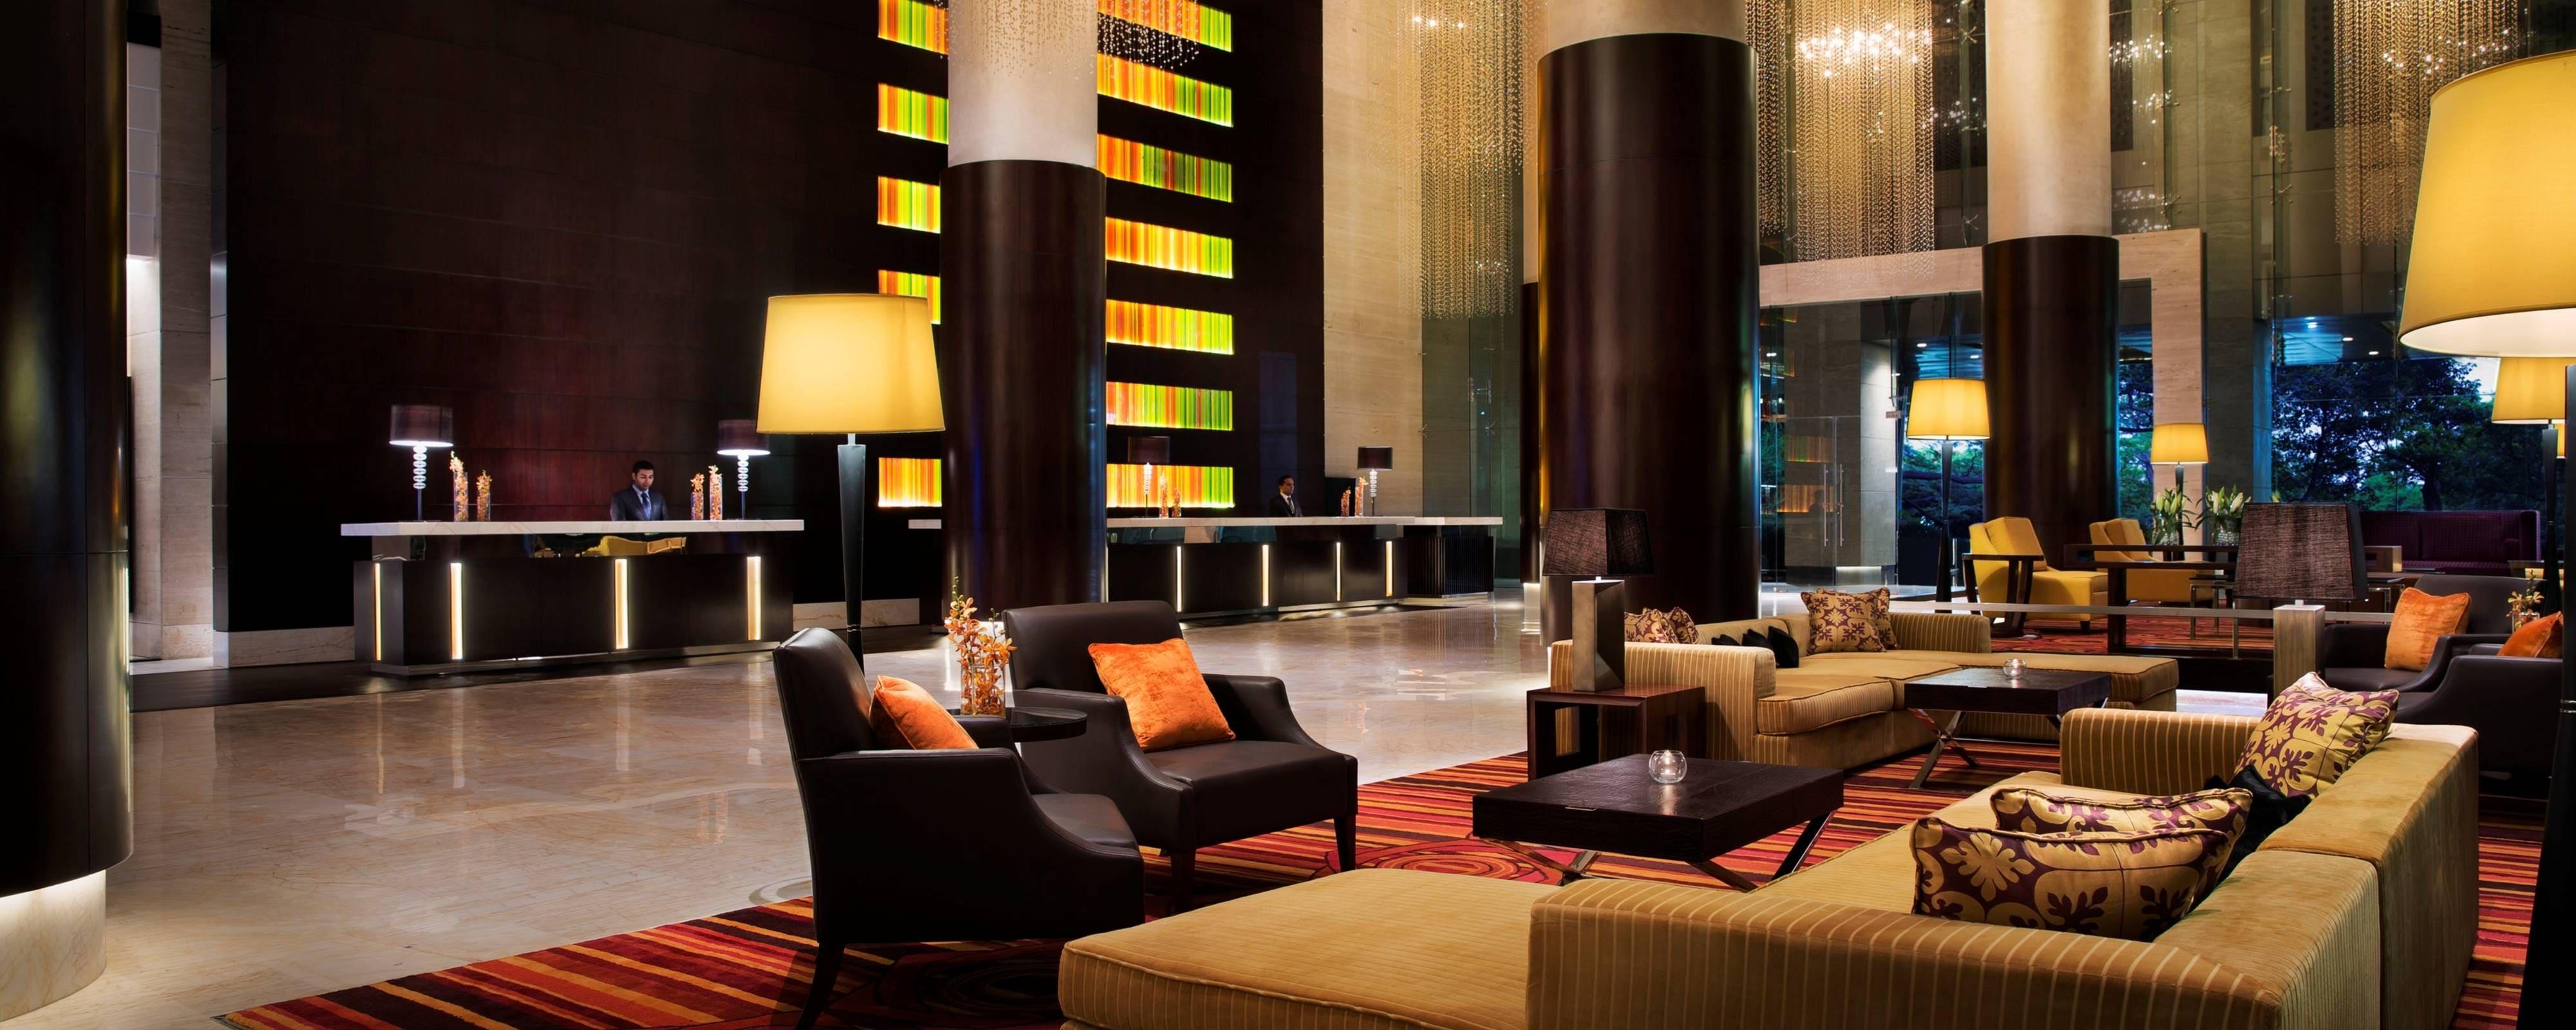 5 Star Luxury Hotel In Bangalore India Jw Marriott